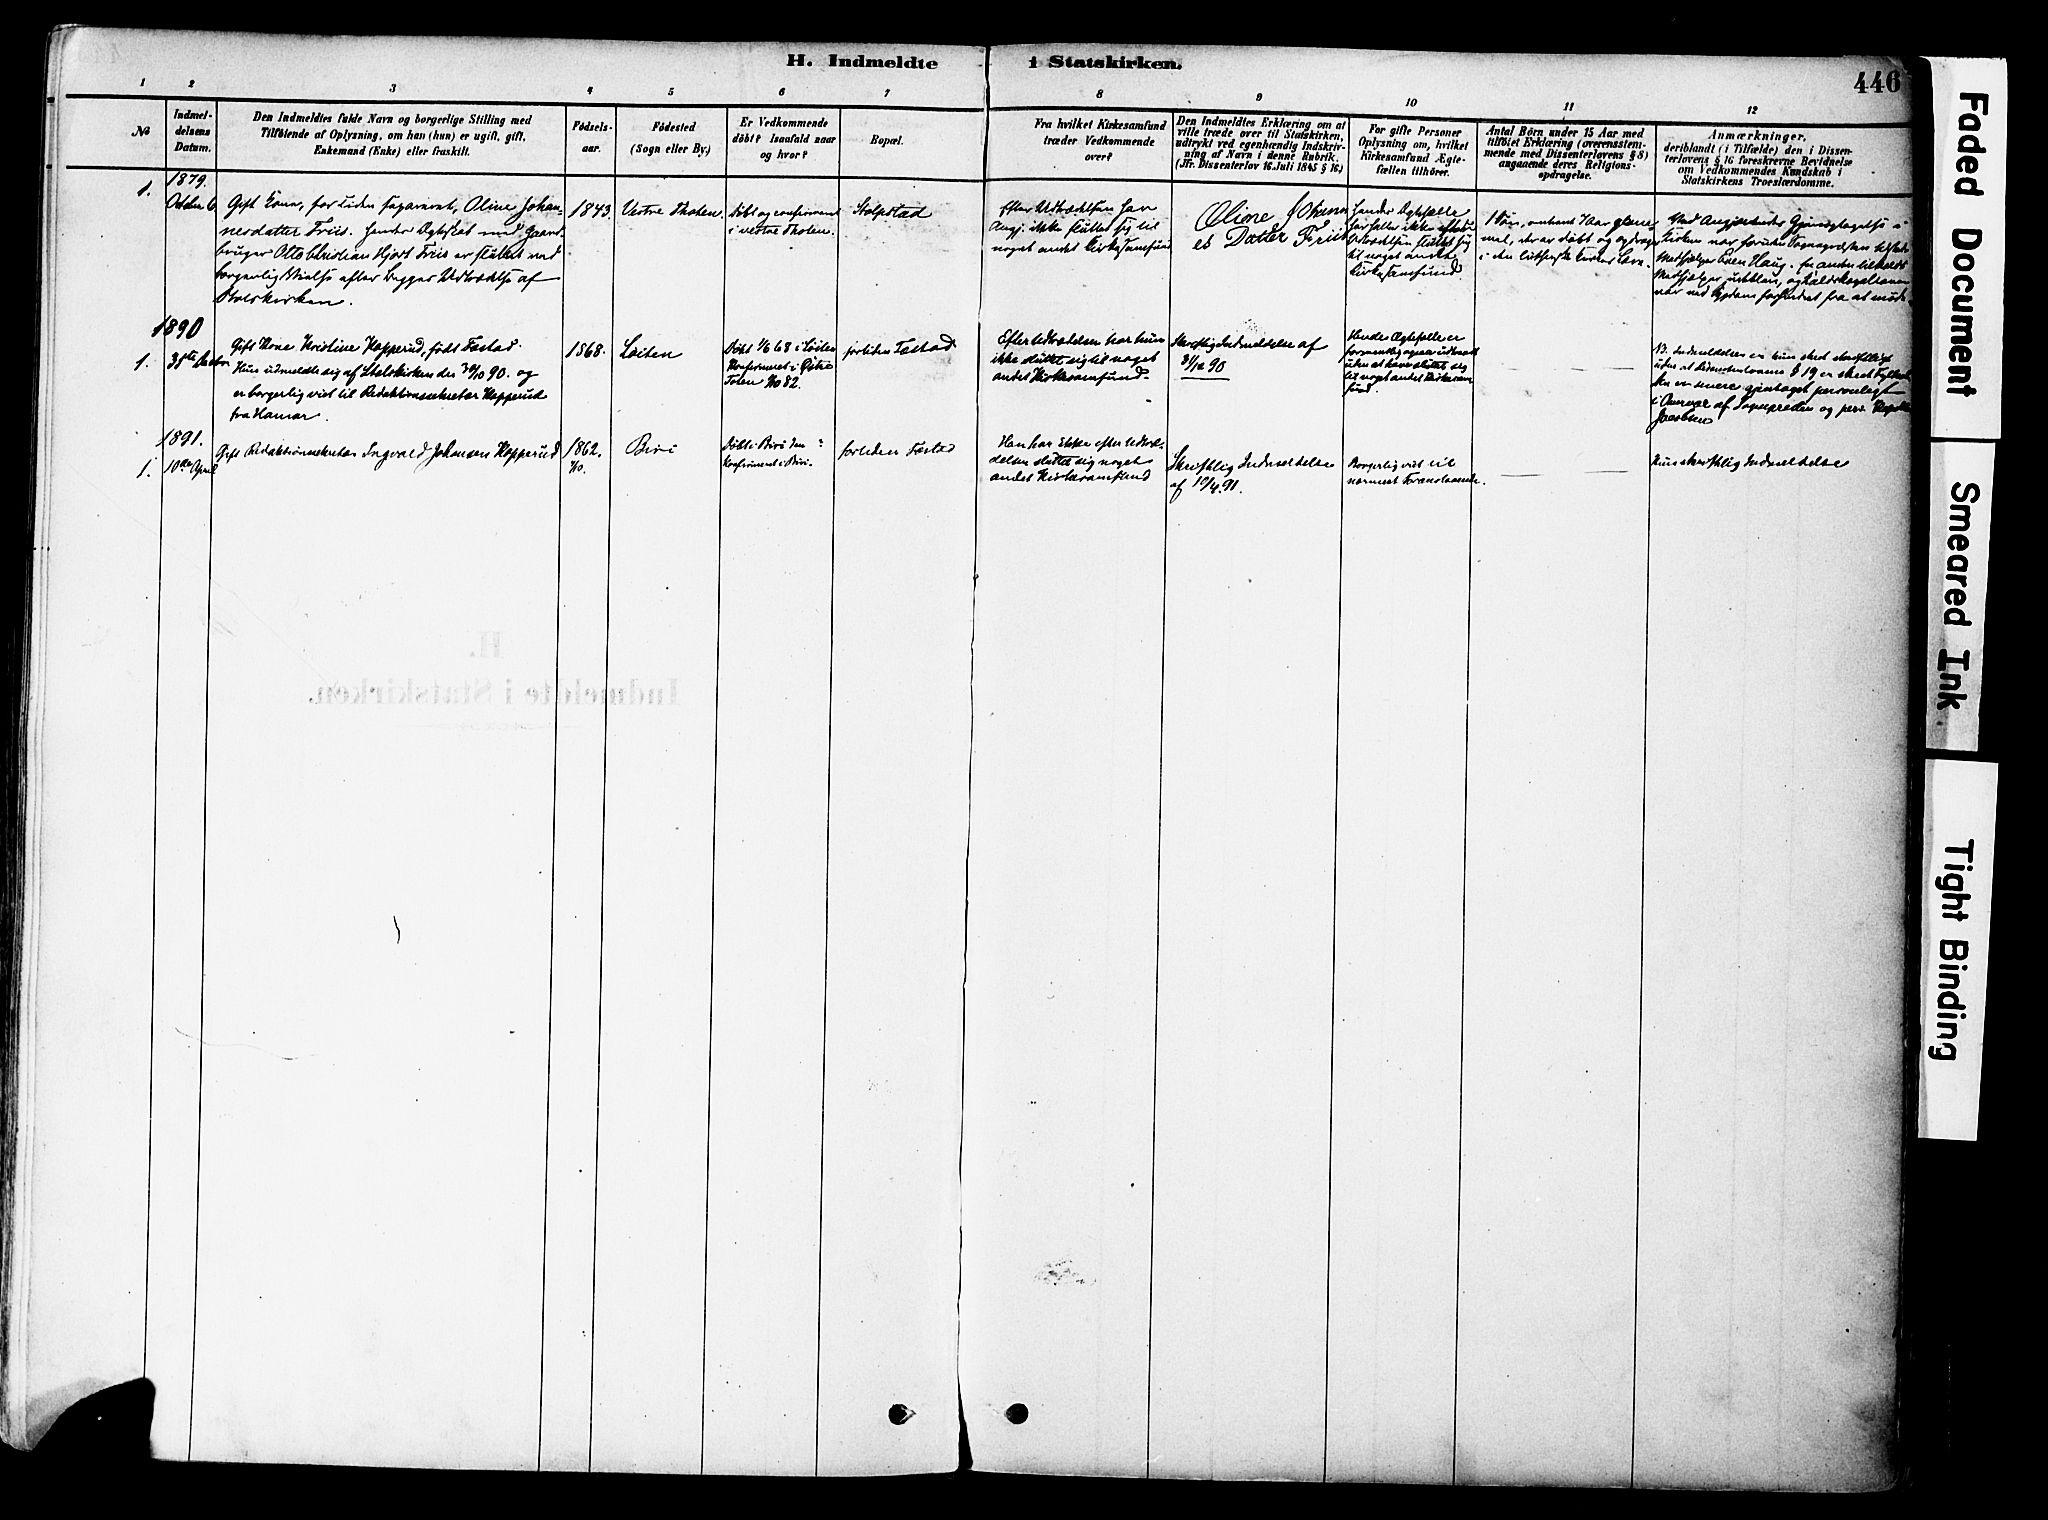 SAH, Østre Toten prestekontor, Ministerialbok nr. 6 /1, 1878-1896, s. 446